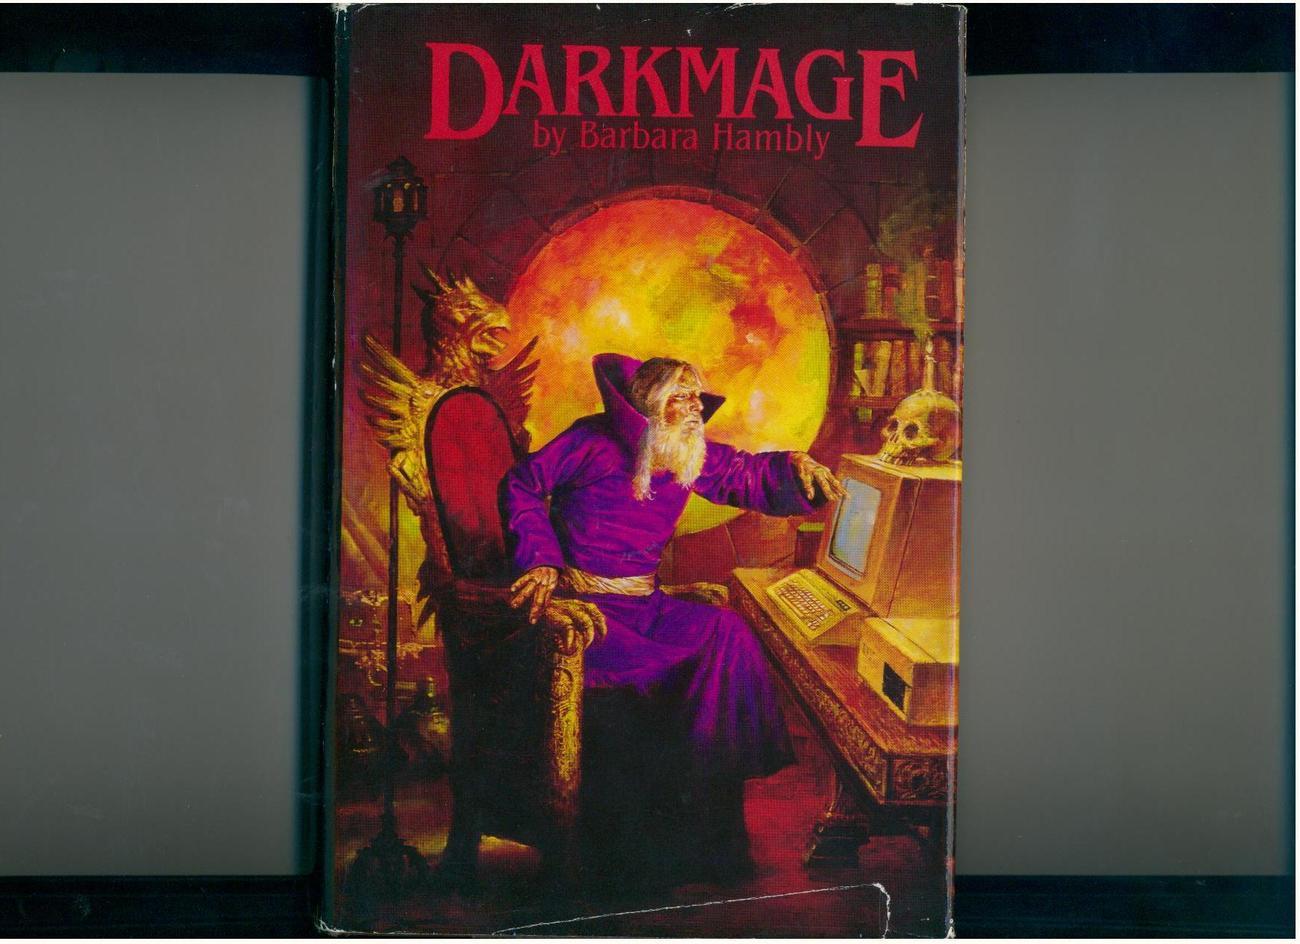 Hambly - DARKMAGE - 2 fantasy novels in 1 - 1980s